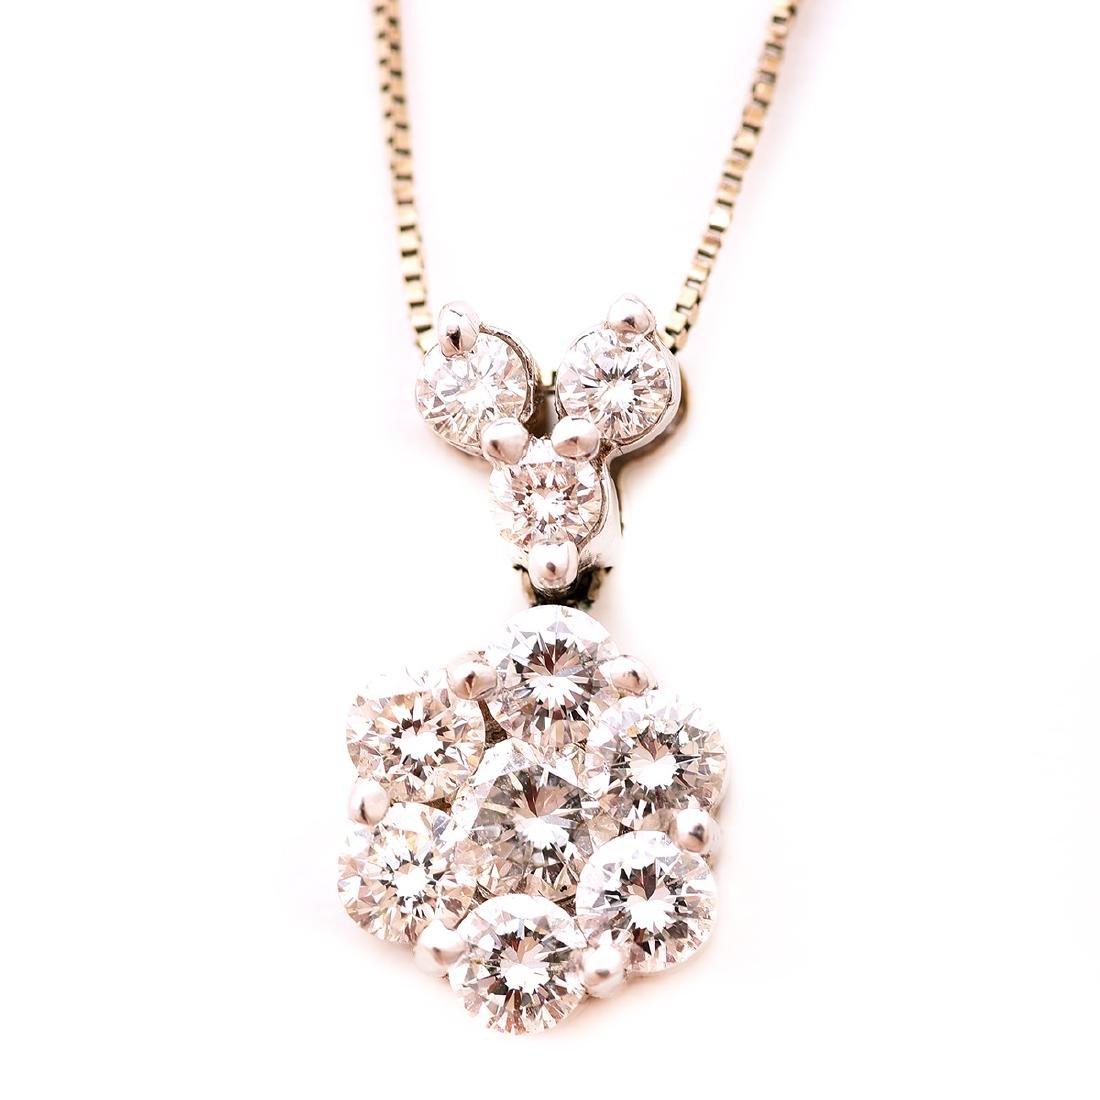 Diamond, 14k White Gold Pendant Necklace.